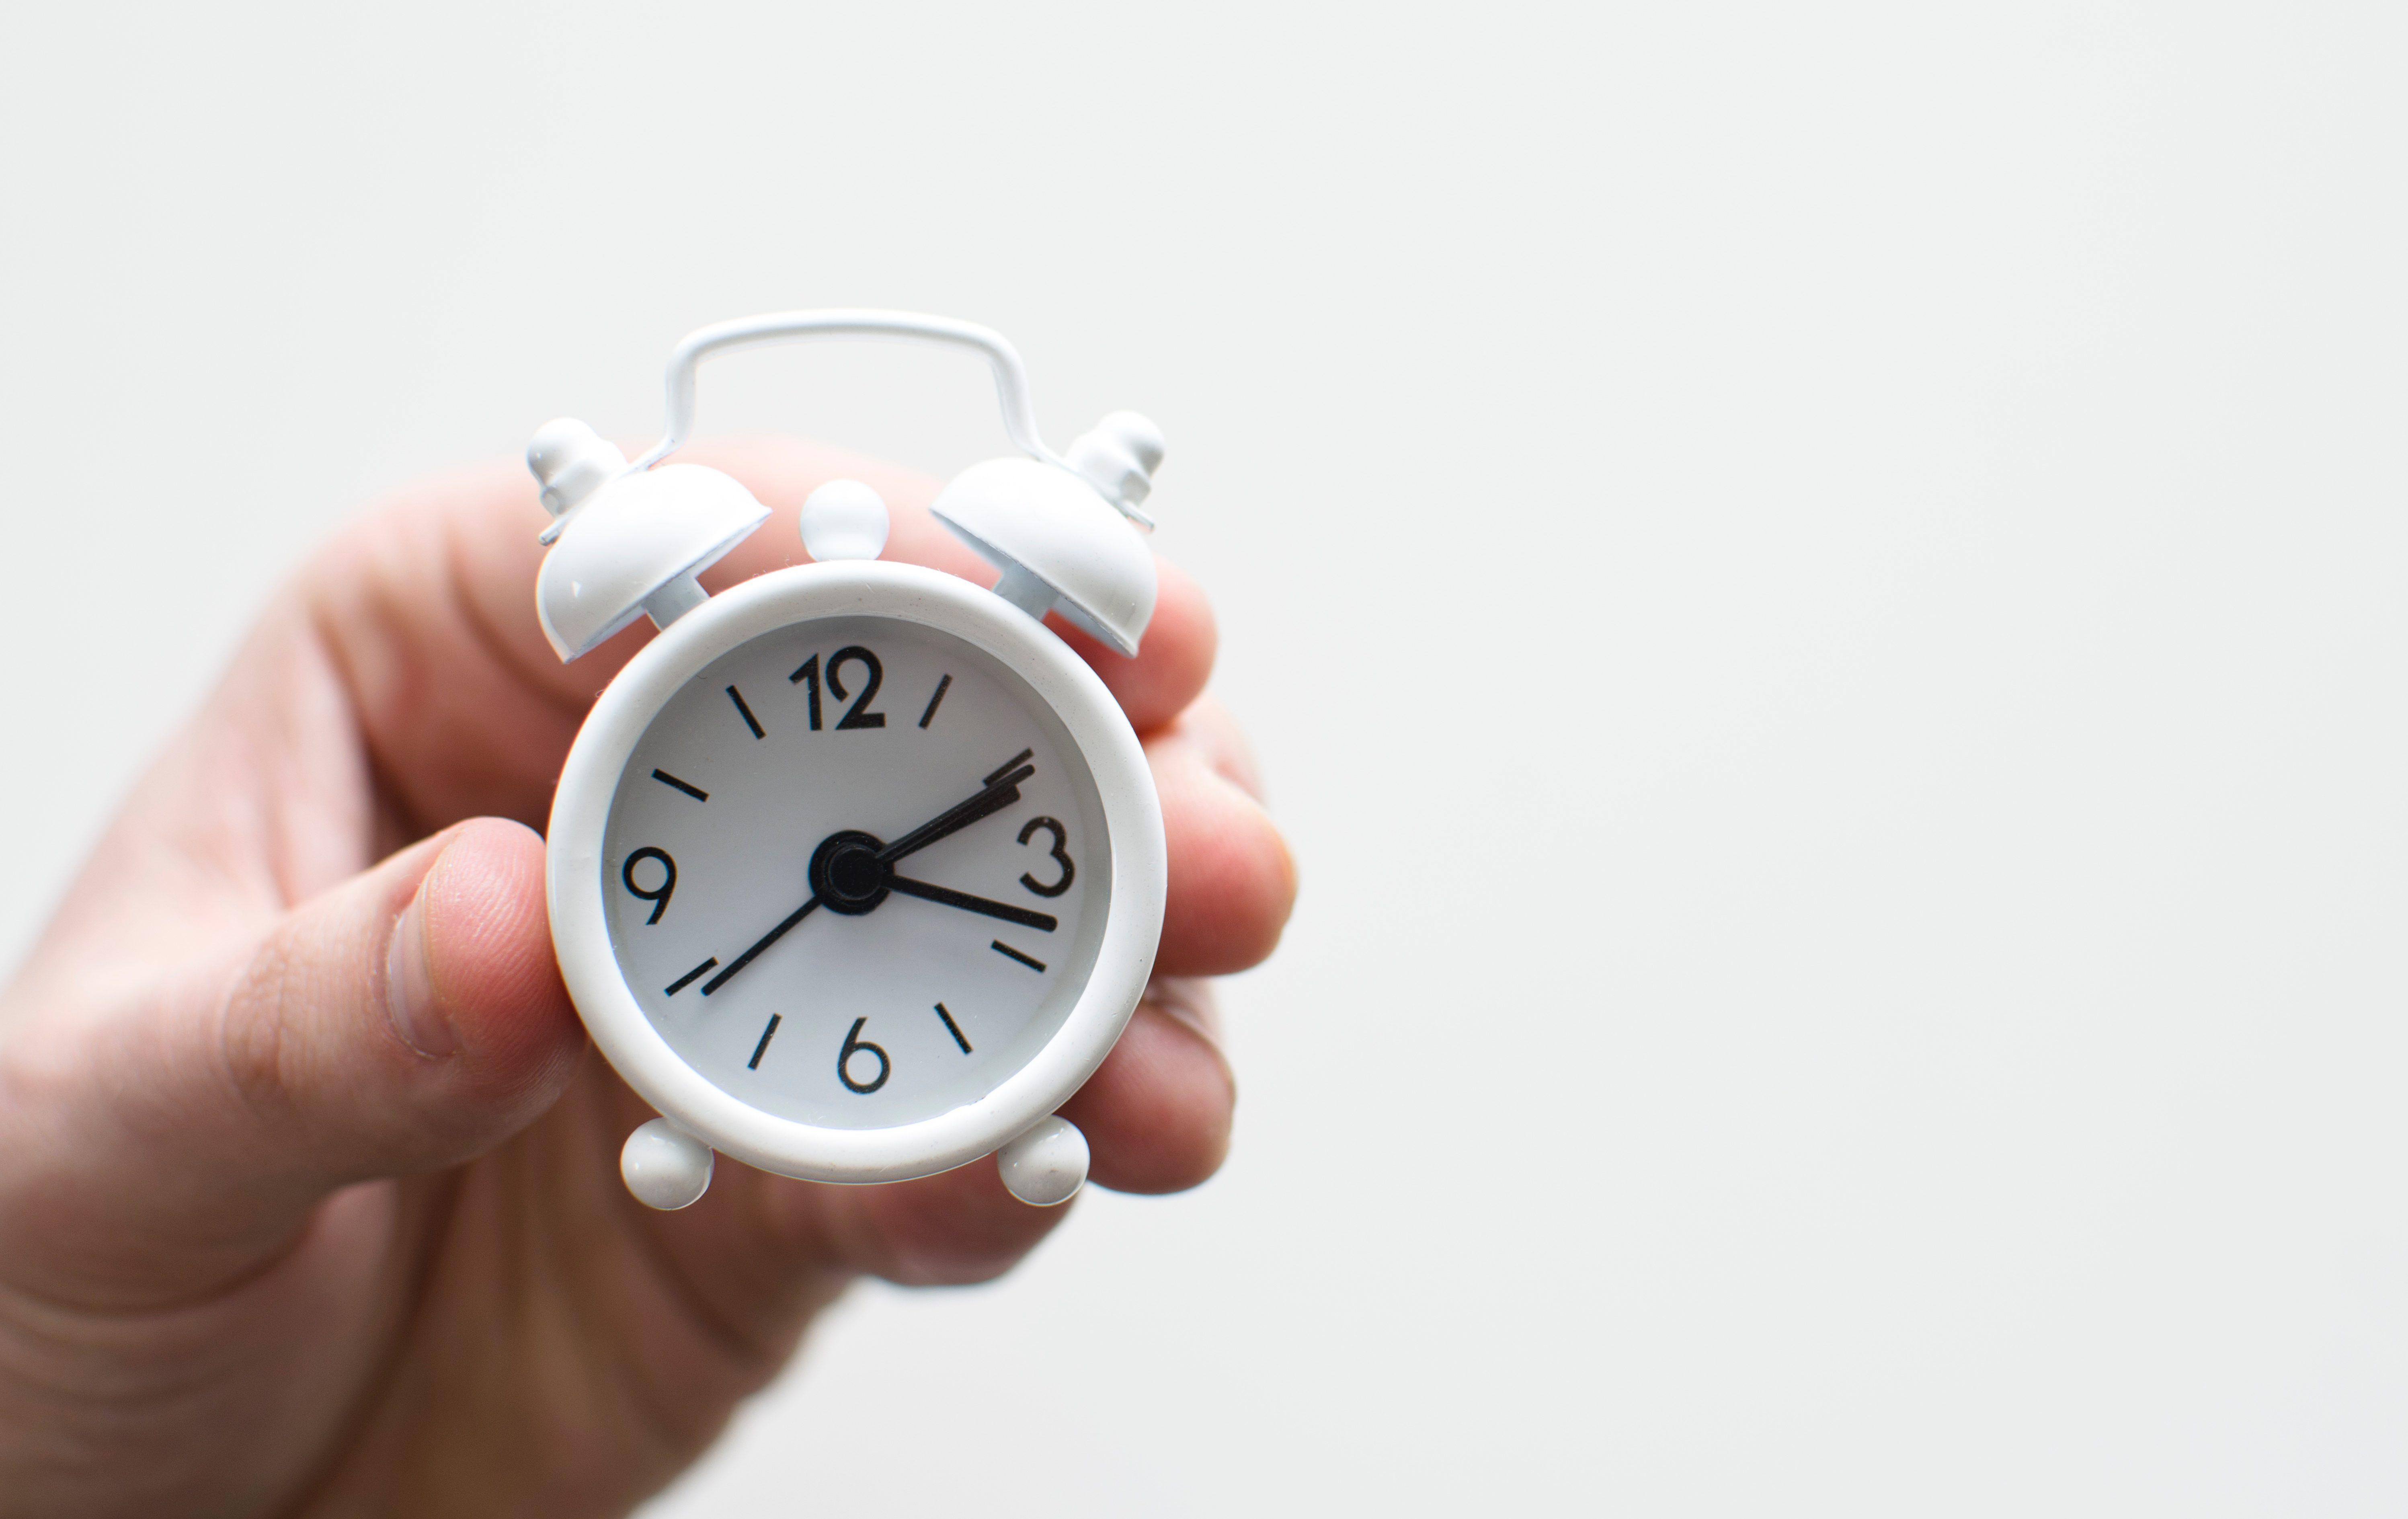 A hand holds a tiny white alarm clock